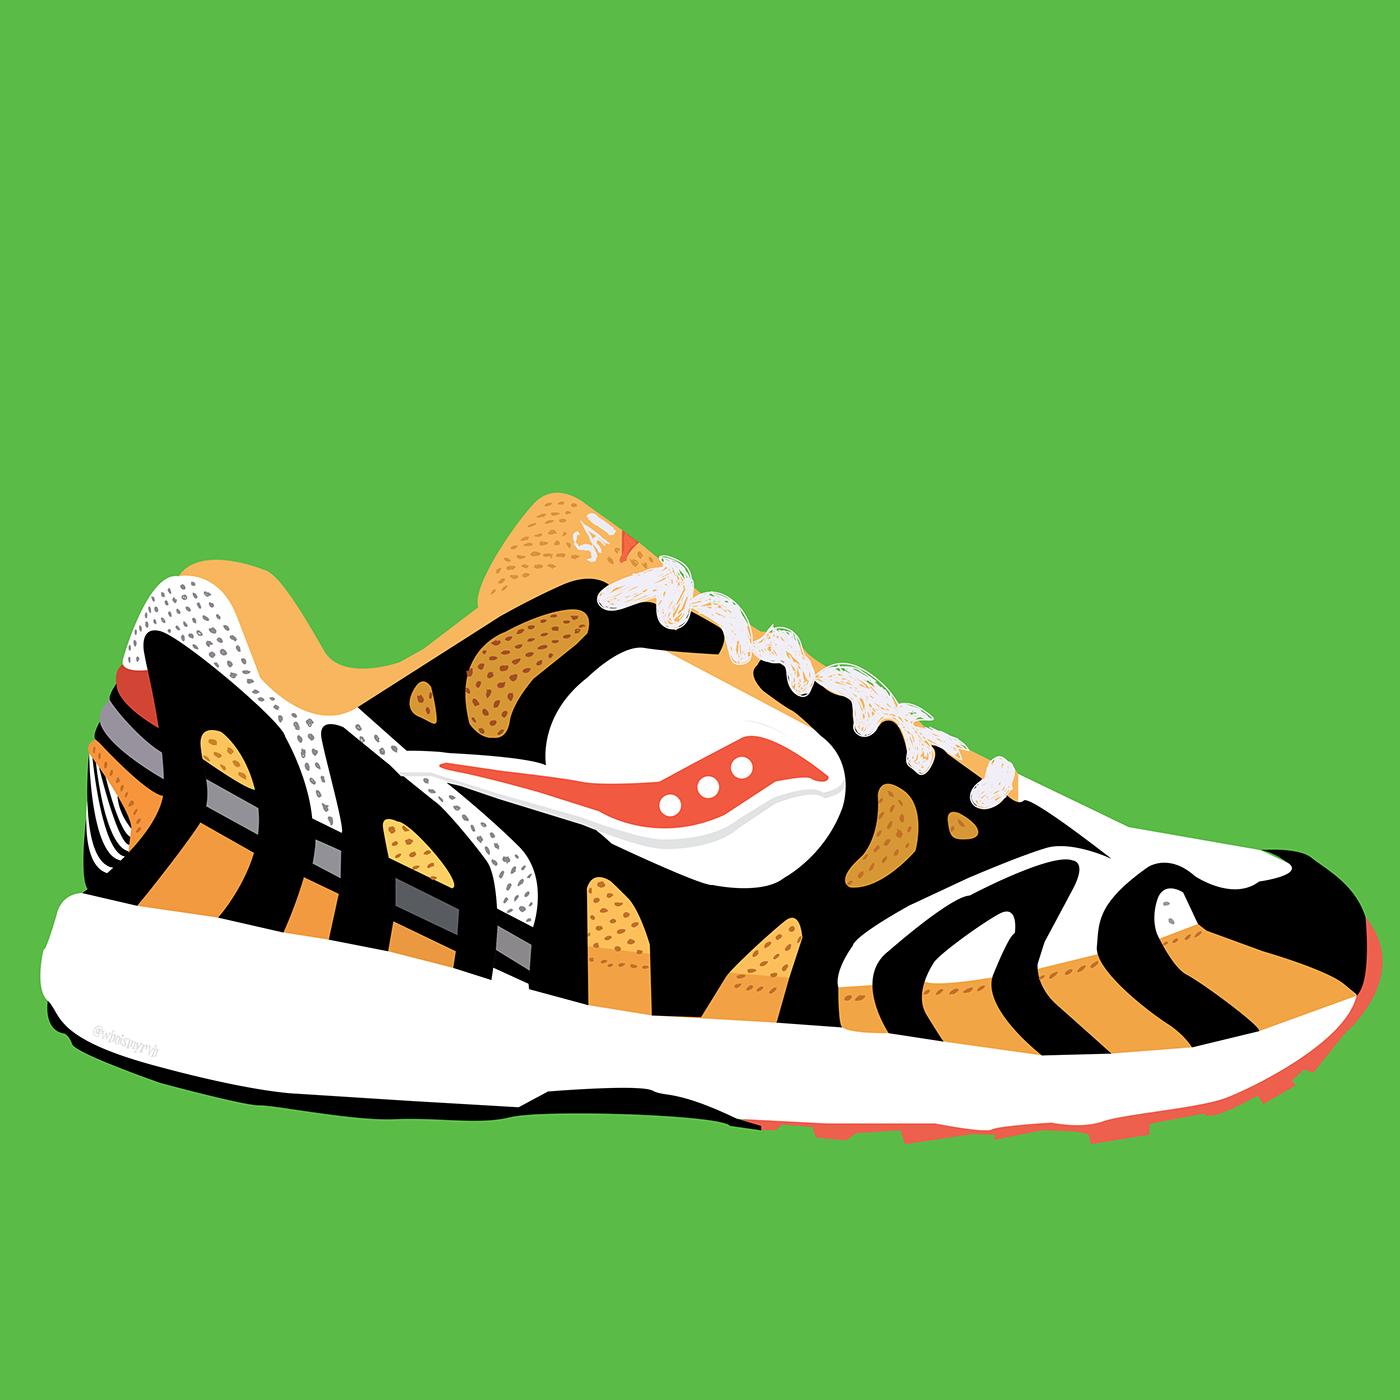 adidas,branding ,brands,designer,Fashion ,footwear,ILLUSTRATION ,Nike,saucony,vectorart